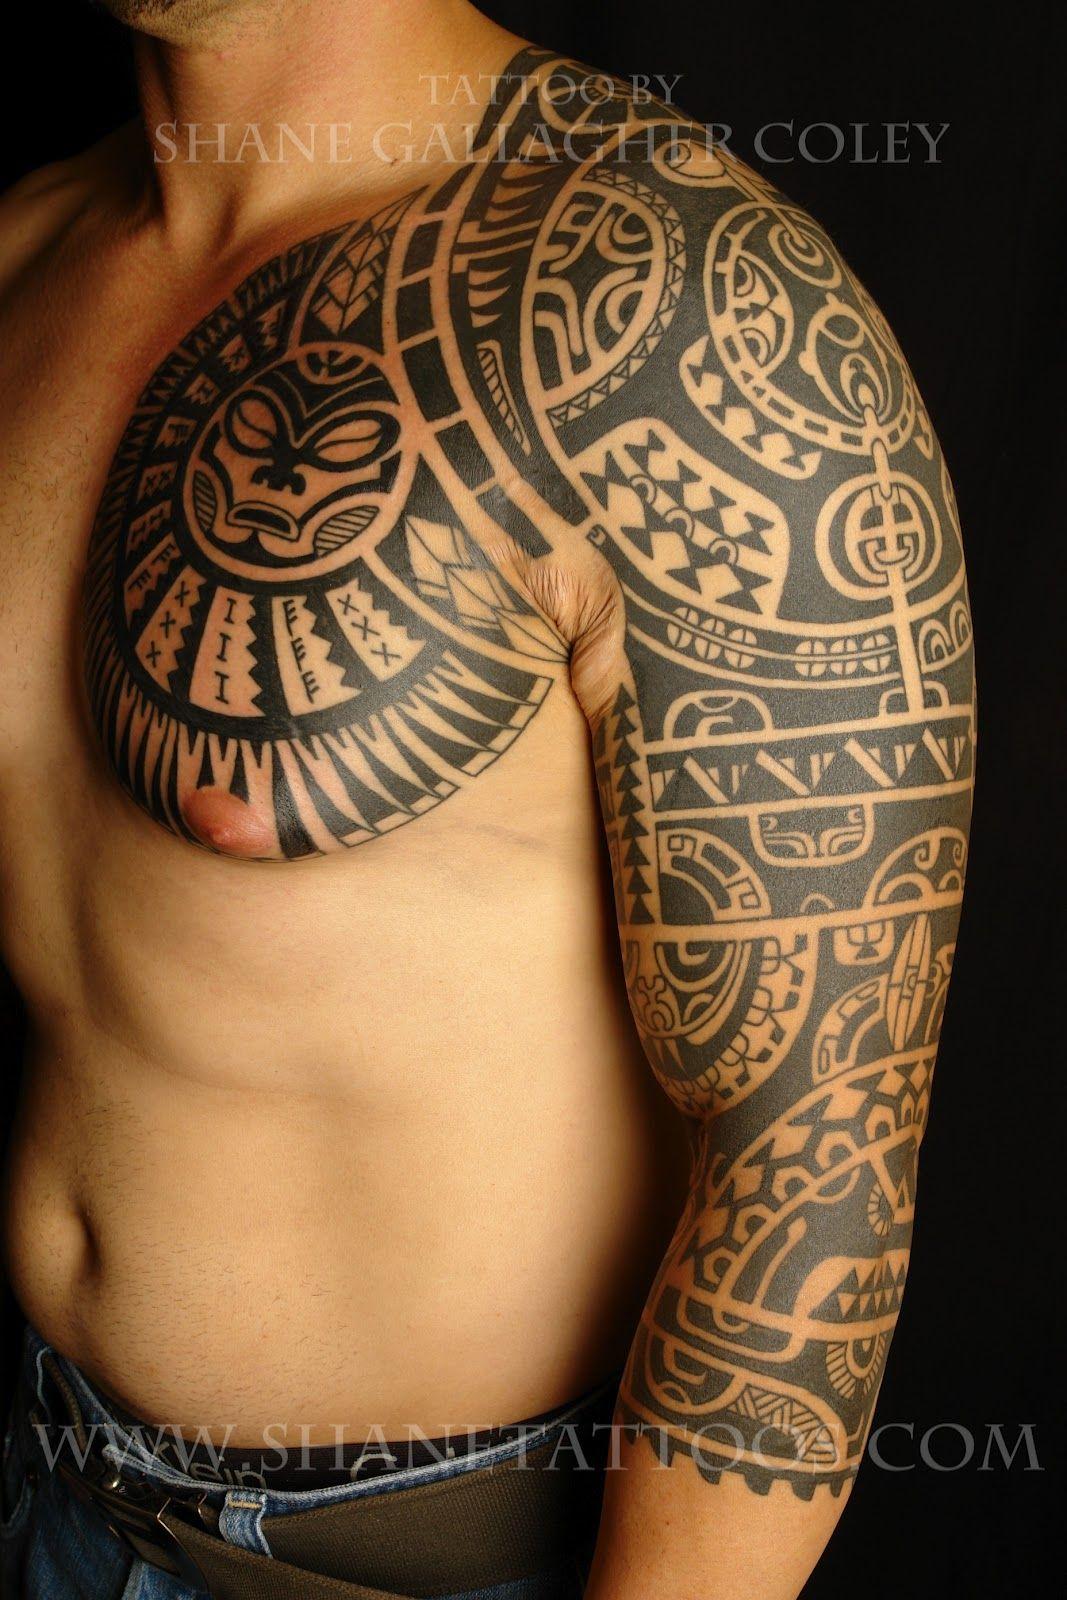 Pin Van Cody Mayberry Op Tattoos Polynesische Tatoeages